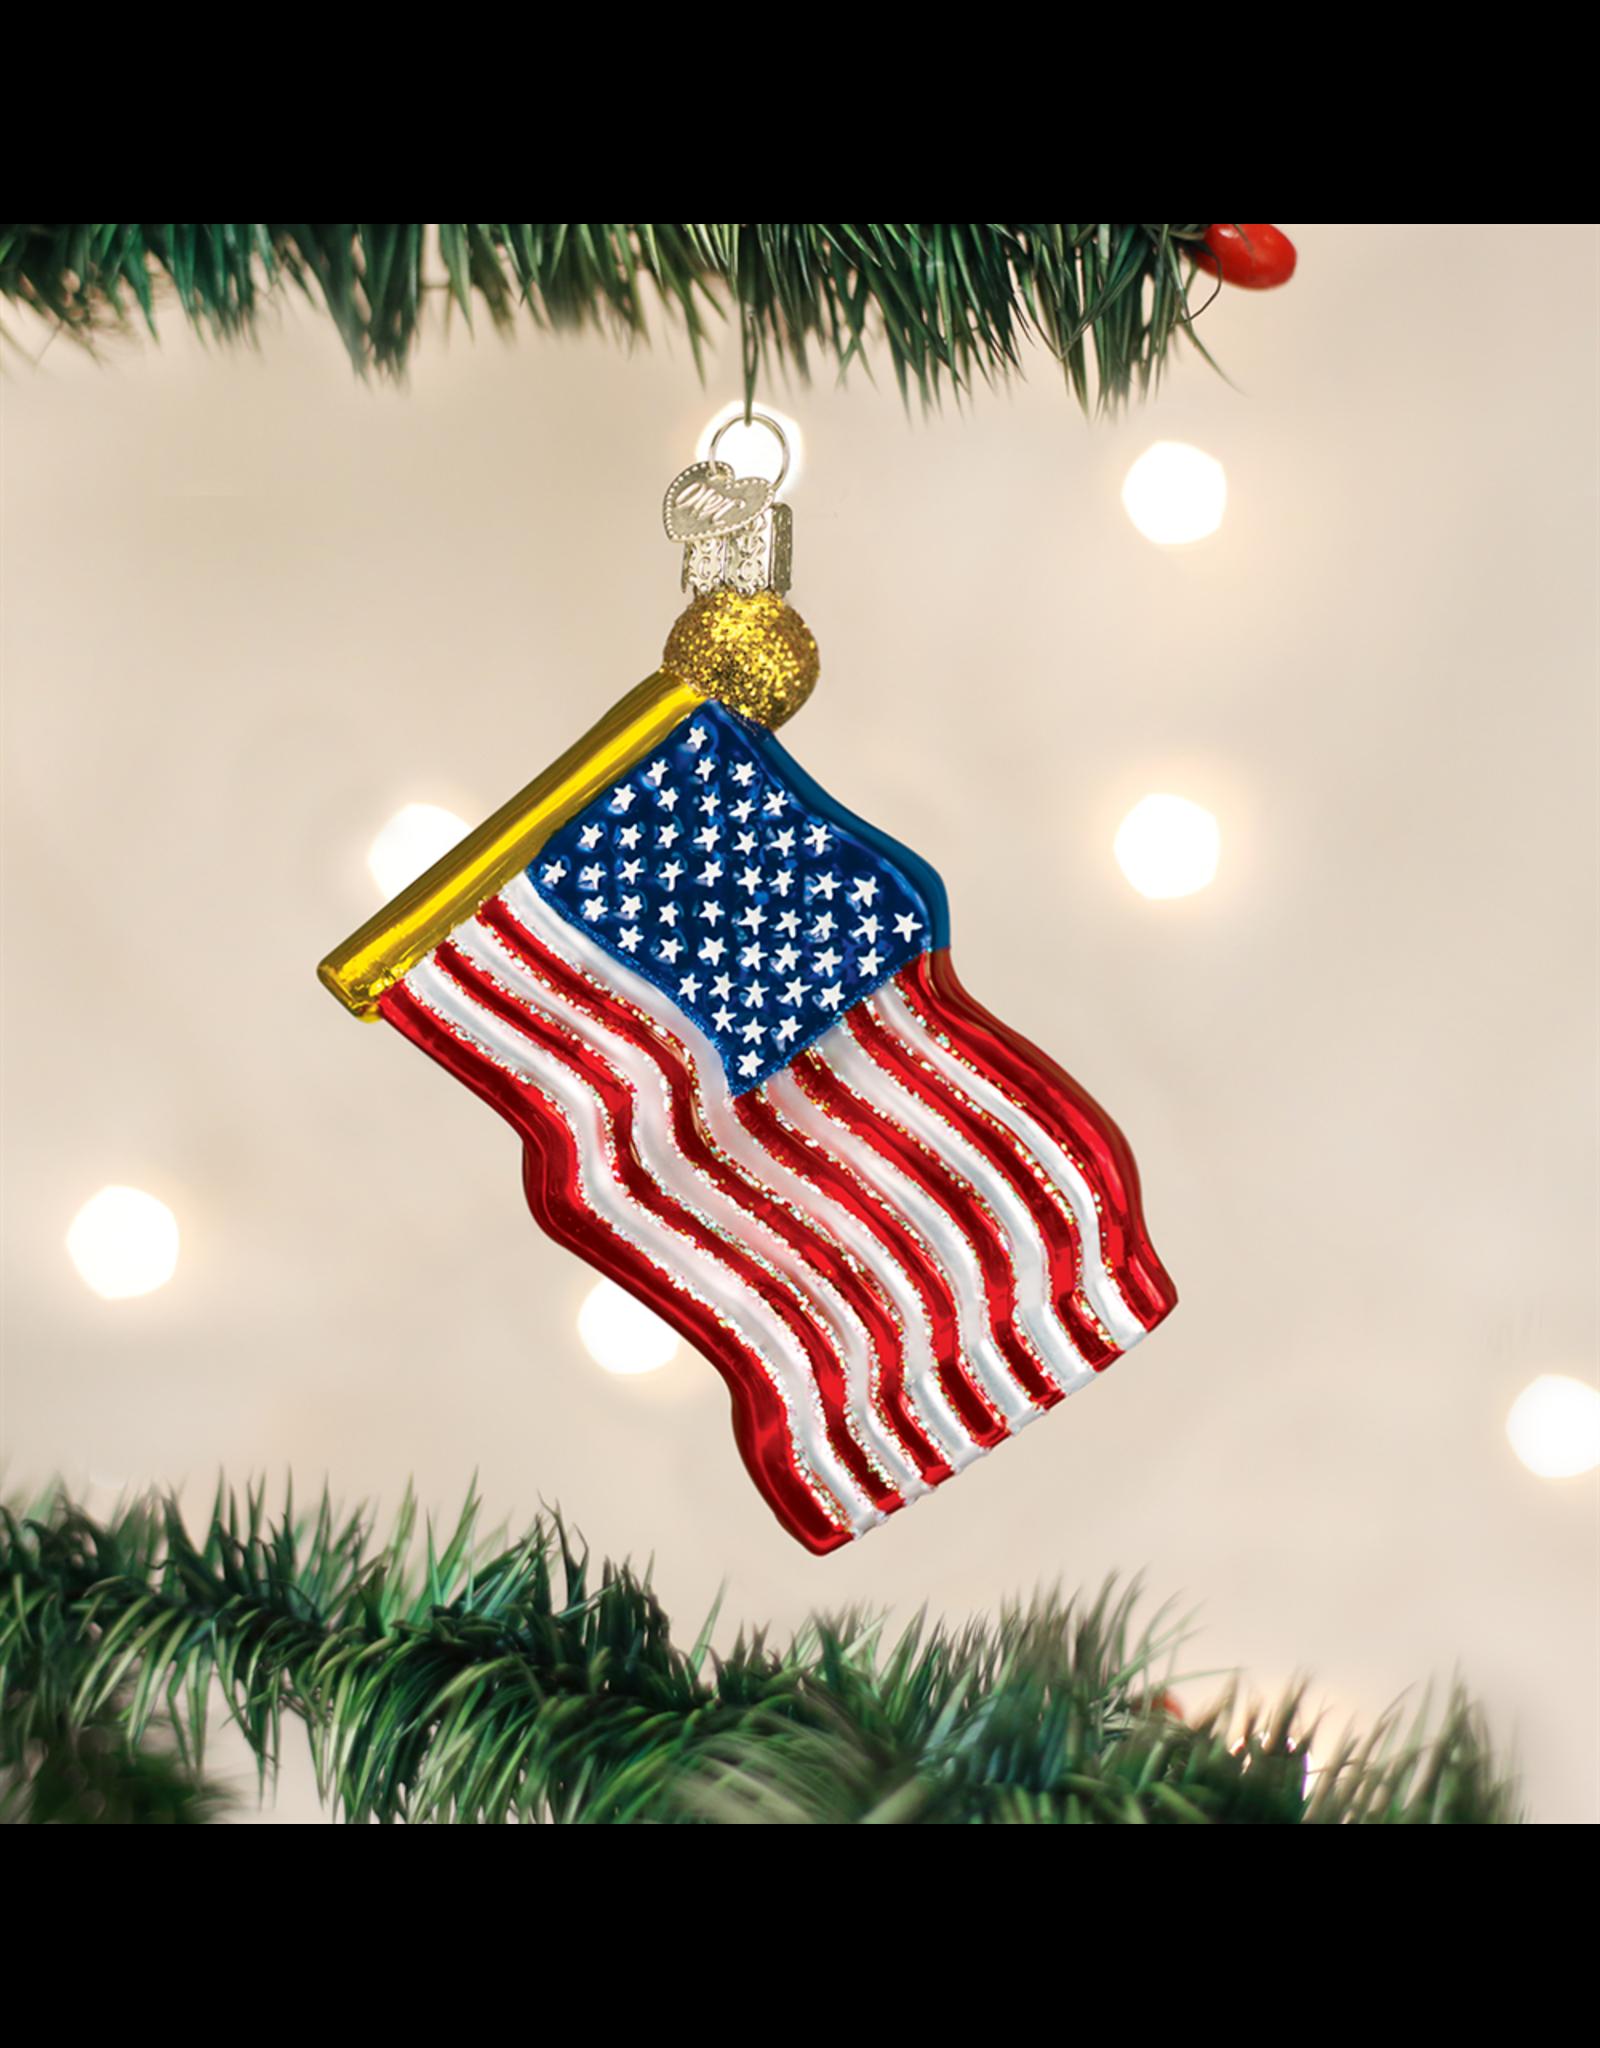 Old World Christmas Star-spangled Banner Ornament